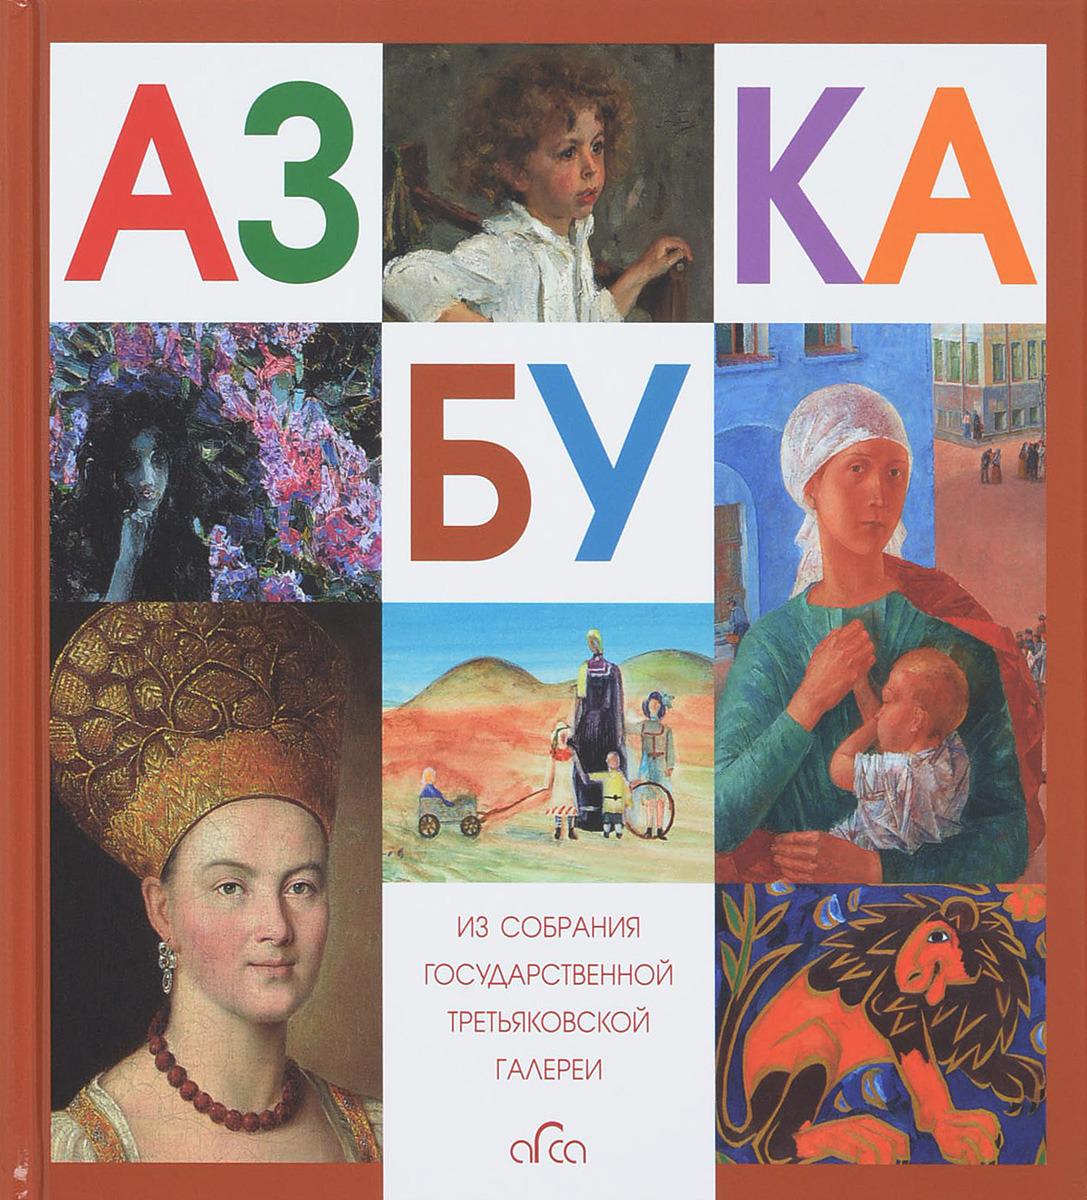 Азбука Третьяковской Галереи нет каталог картинной галереи живопись скульптура